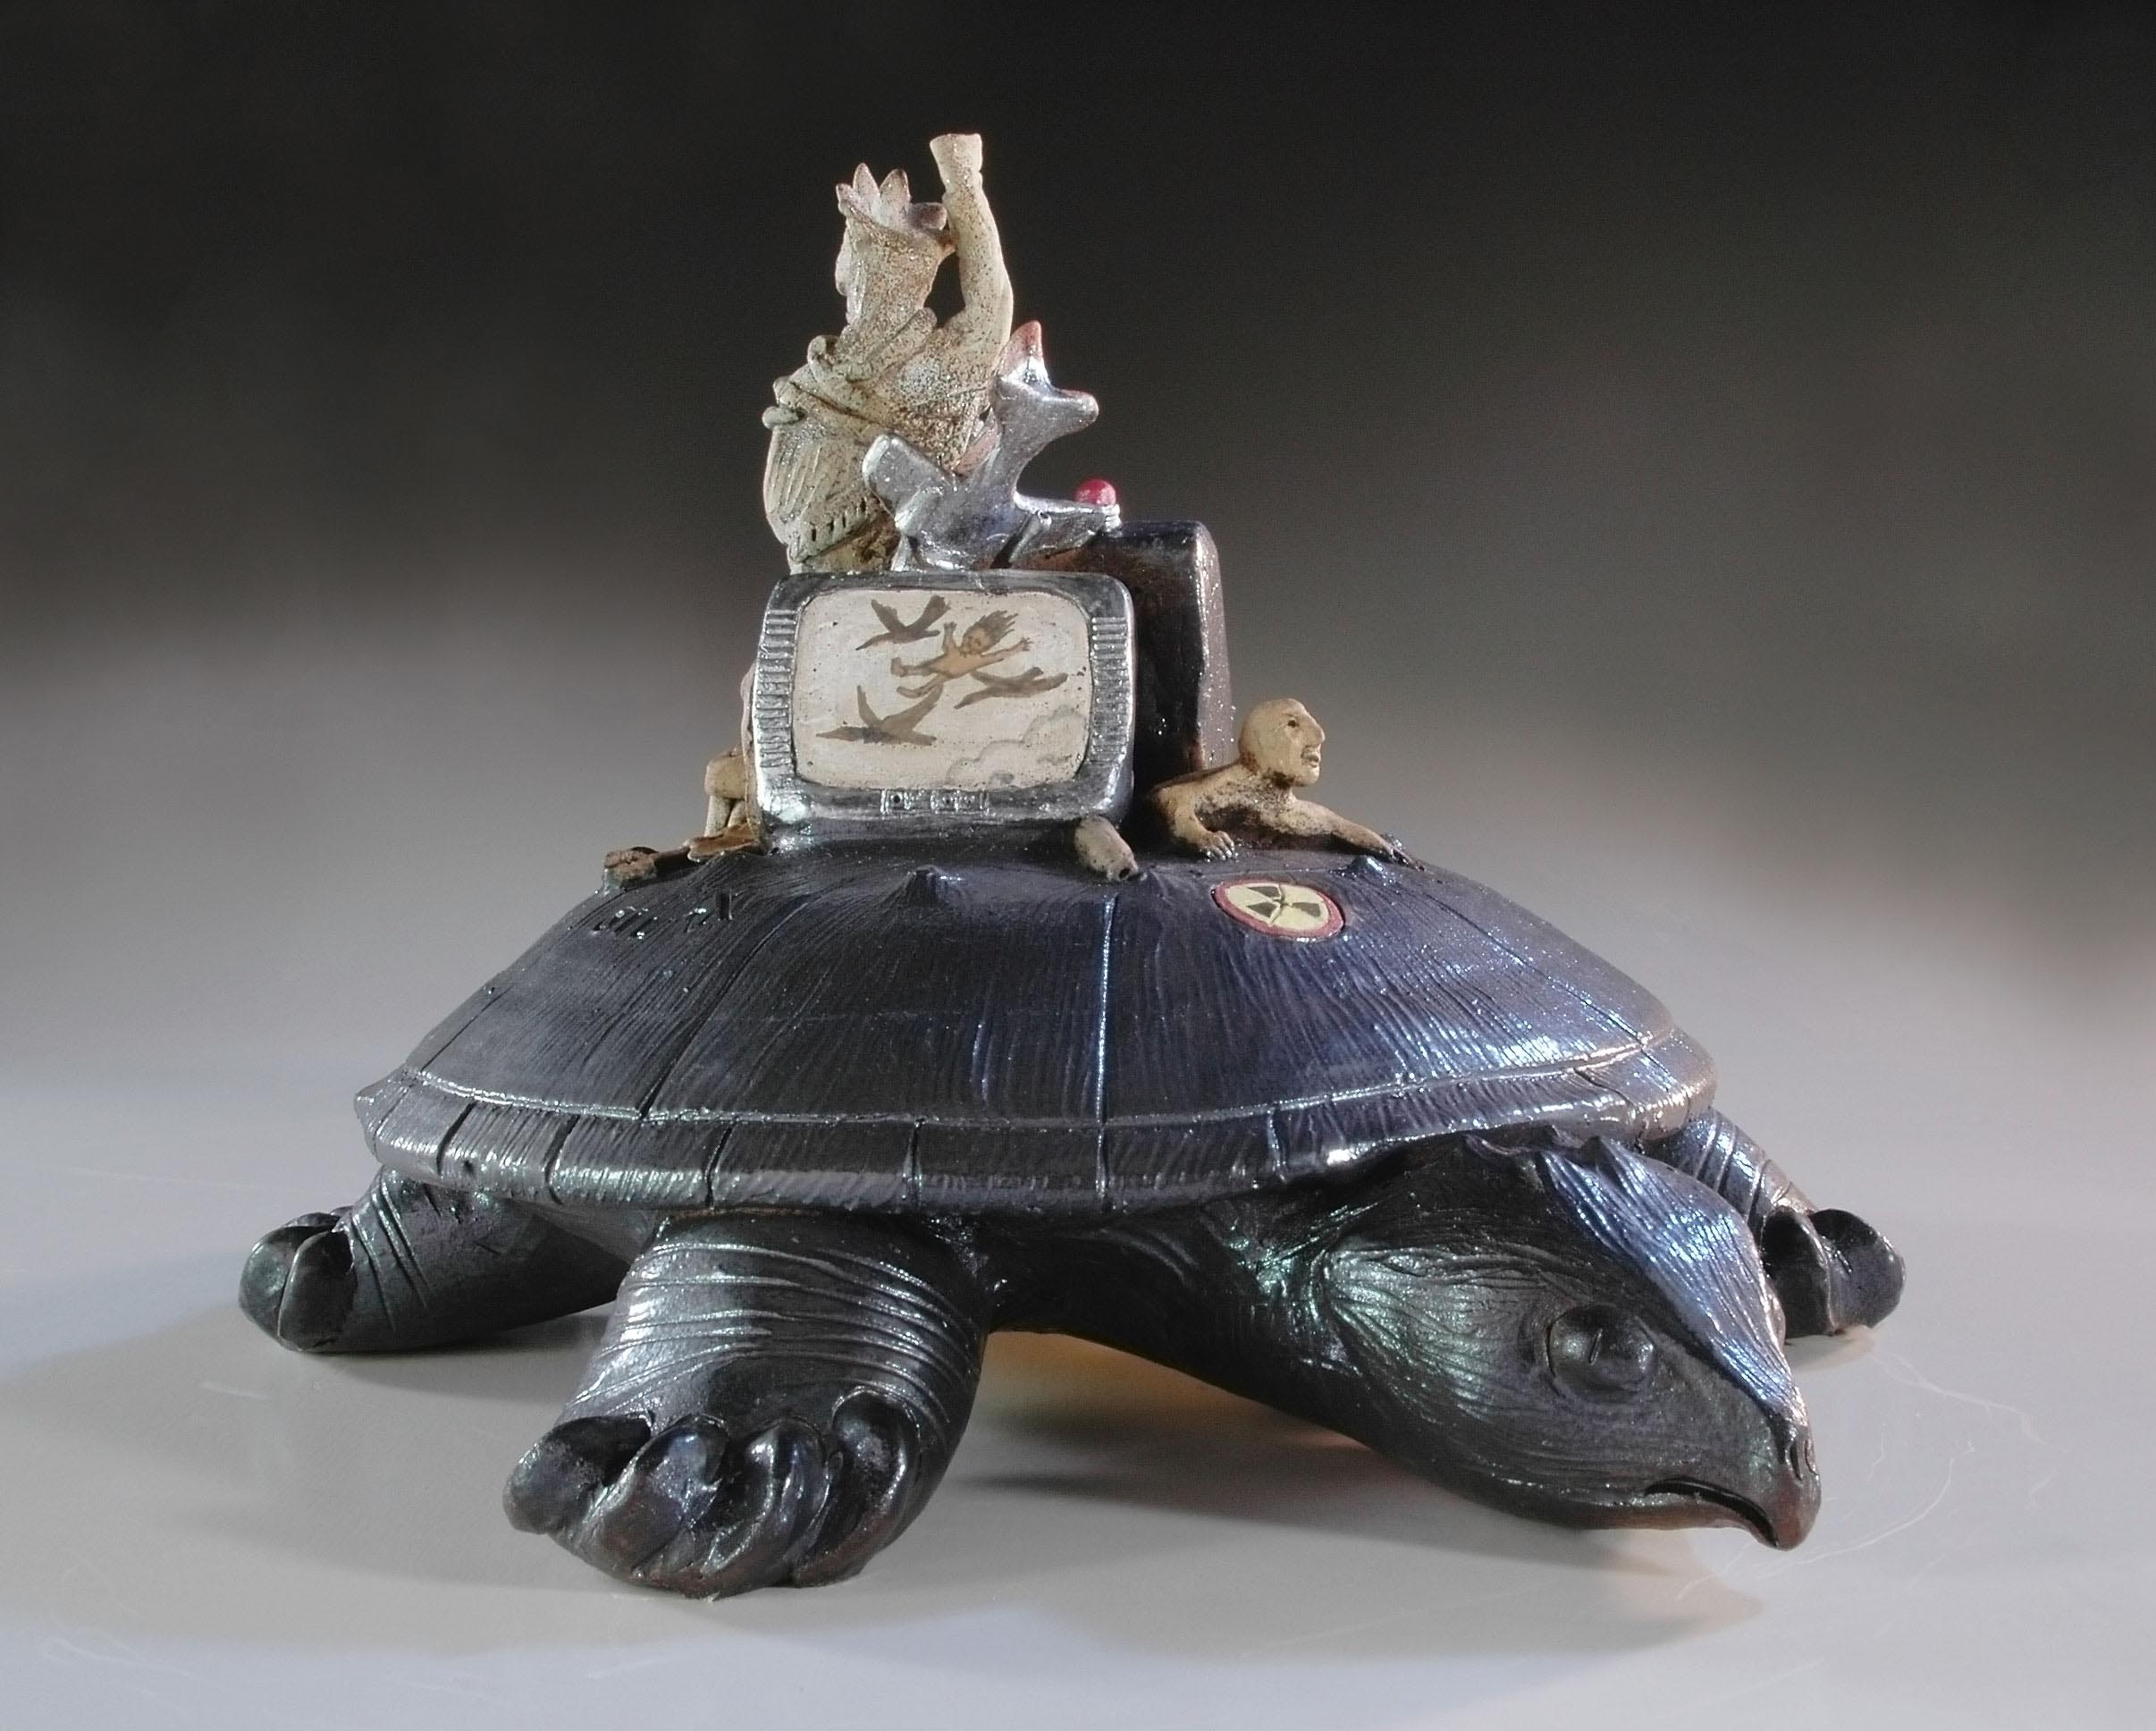 4-Peter_B_Jones_2004_Turtle_Island-Sky_Woman_Stoneware_10_x_16.jpg